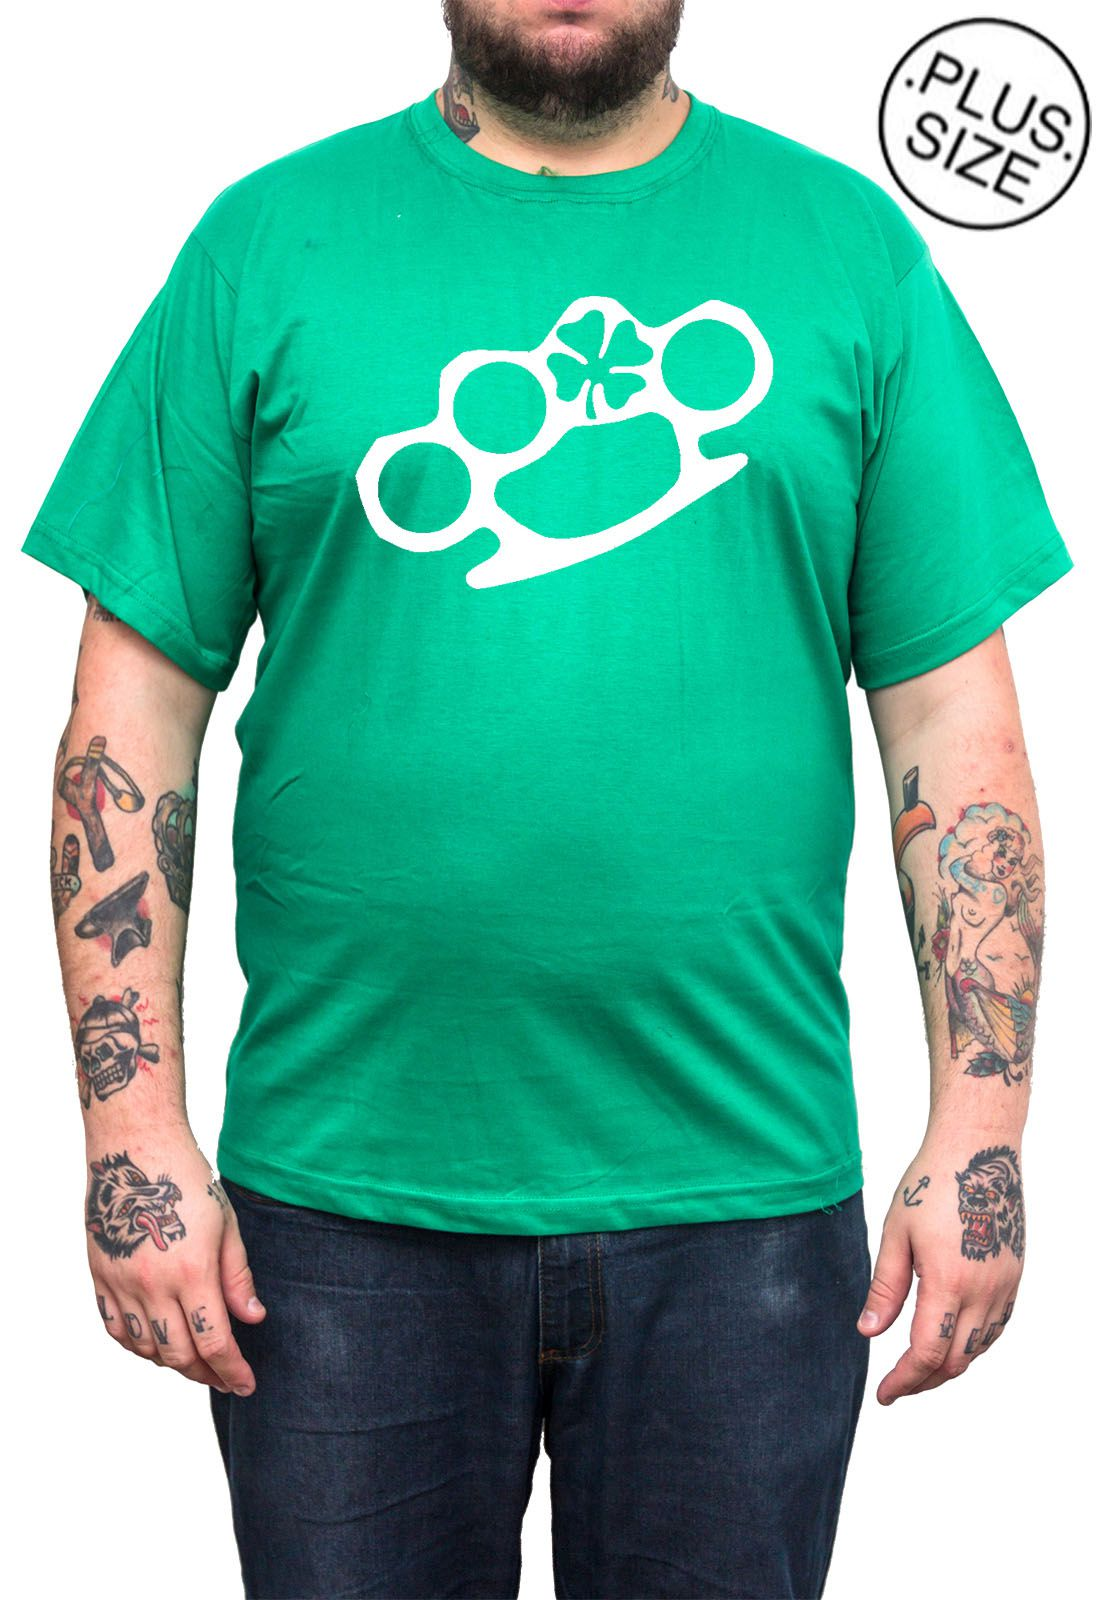 Camiseta Hshop Soco Inglês - Verde Bandeira - Plus Size - Tamanho Grande XG  - HShop